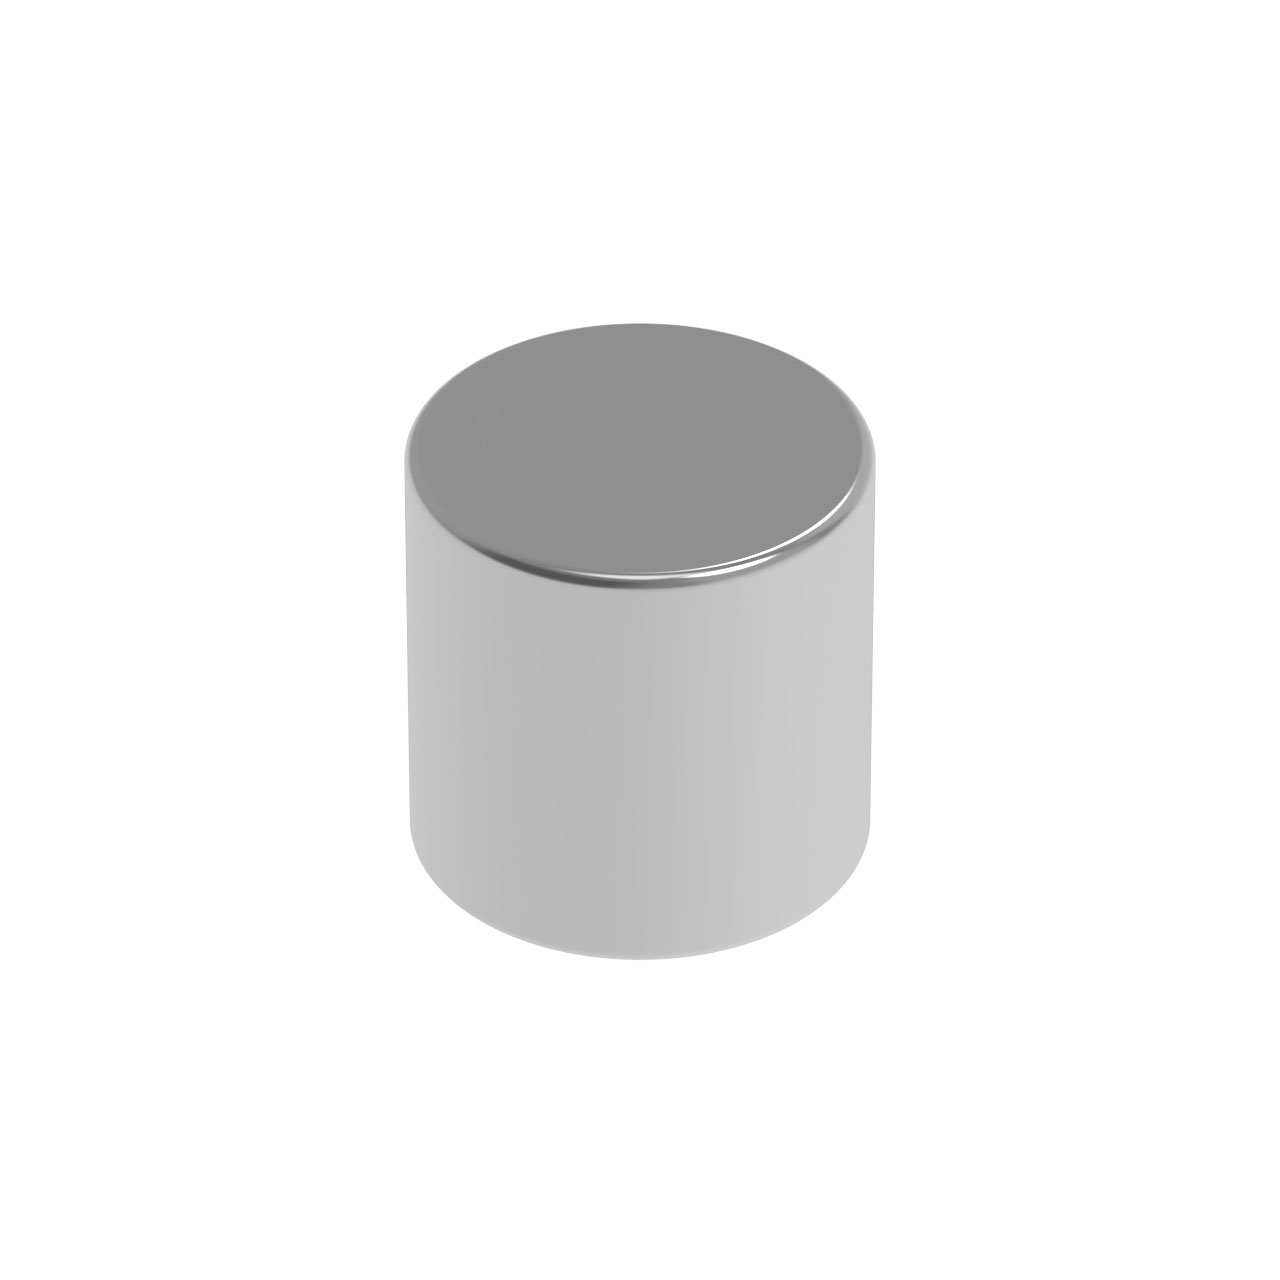 HIQPARTS(ハイキューパーツ) ネオジム磁石 N52 丸形 直径3mm x 高さ3mm(10個入) [MGN3030] 4573211370676